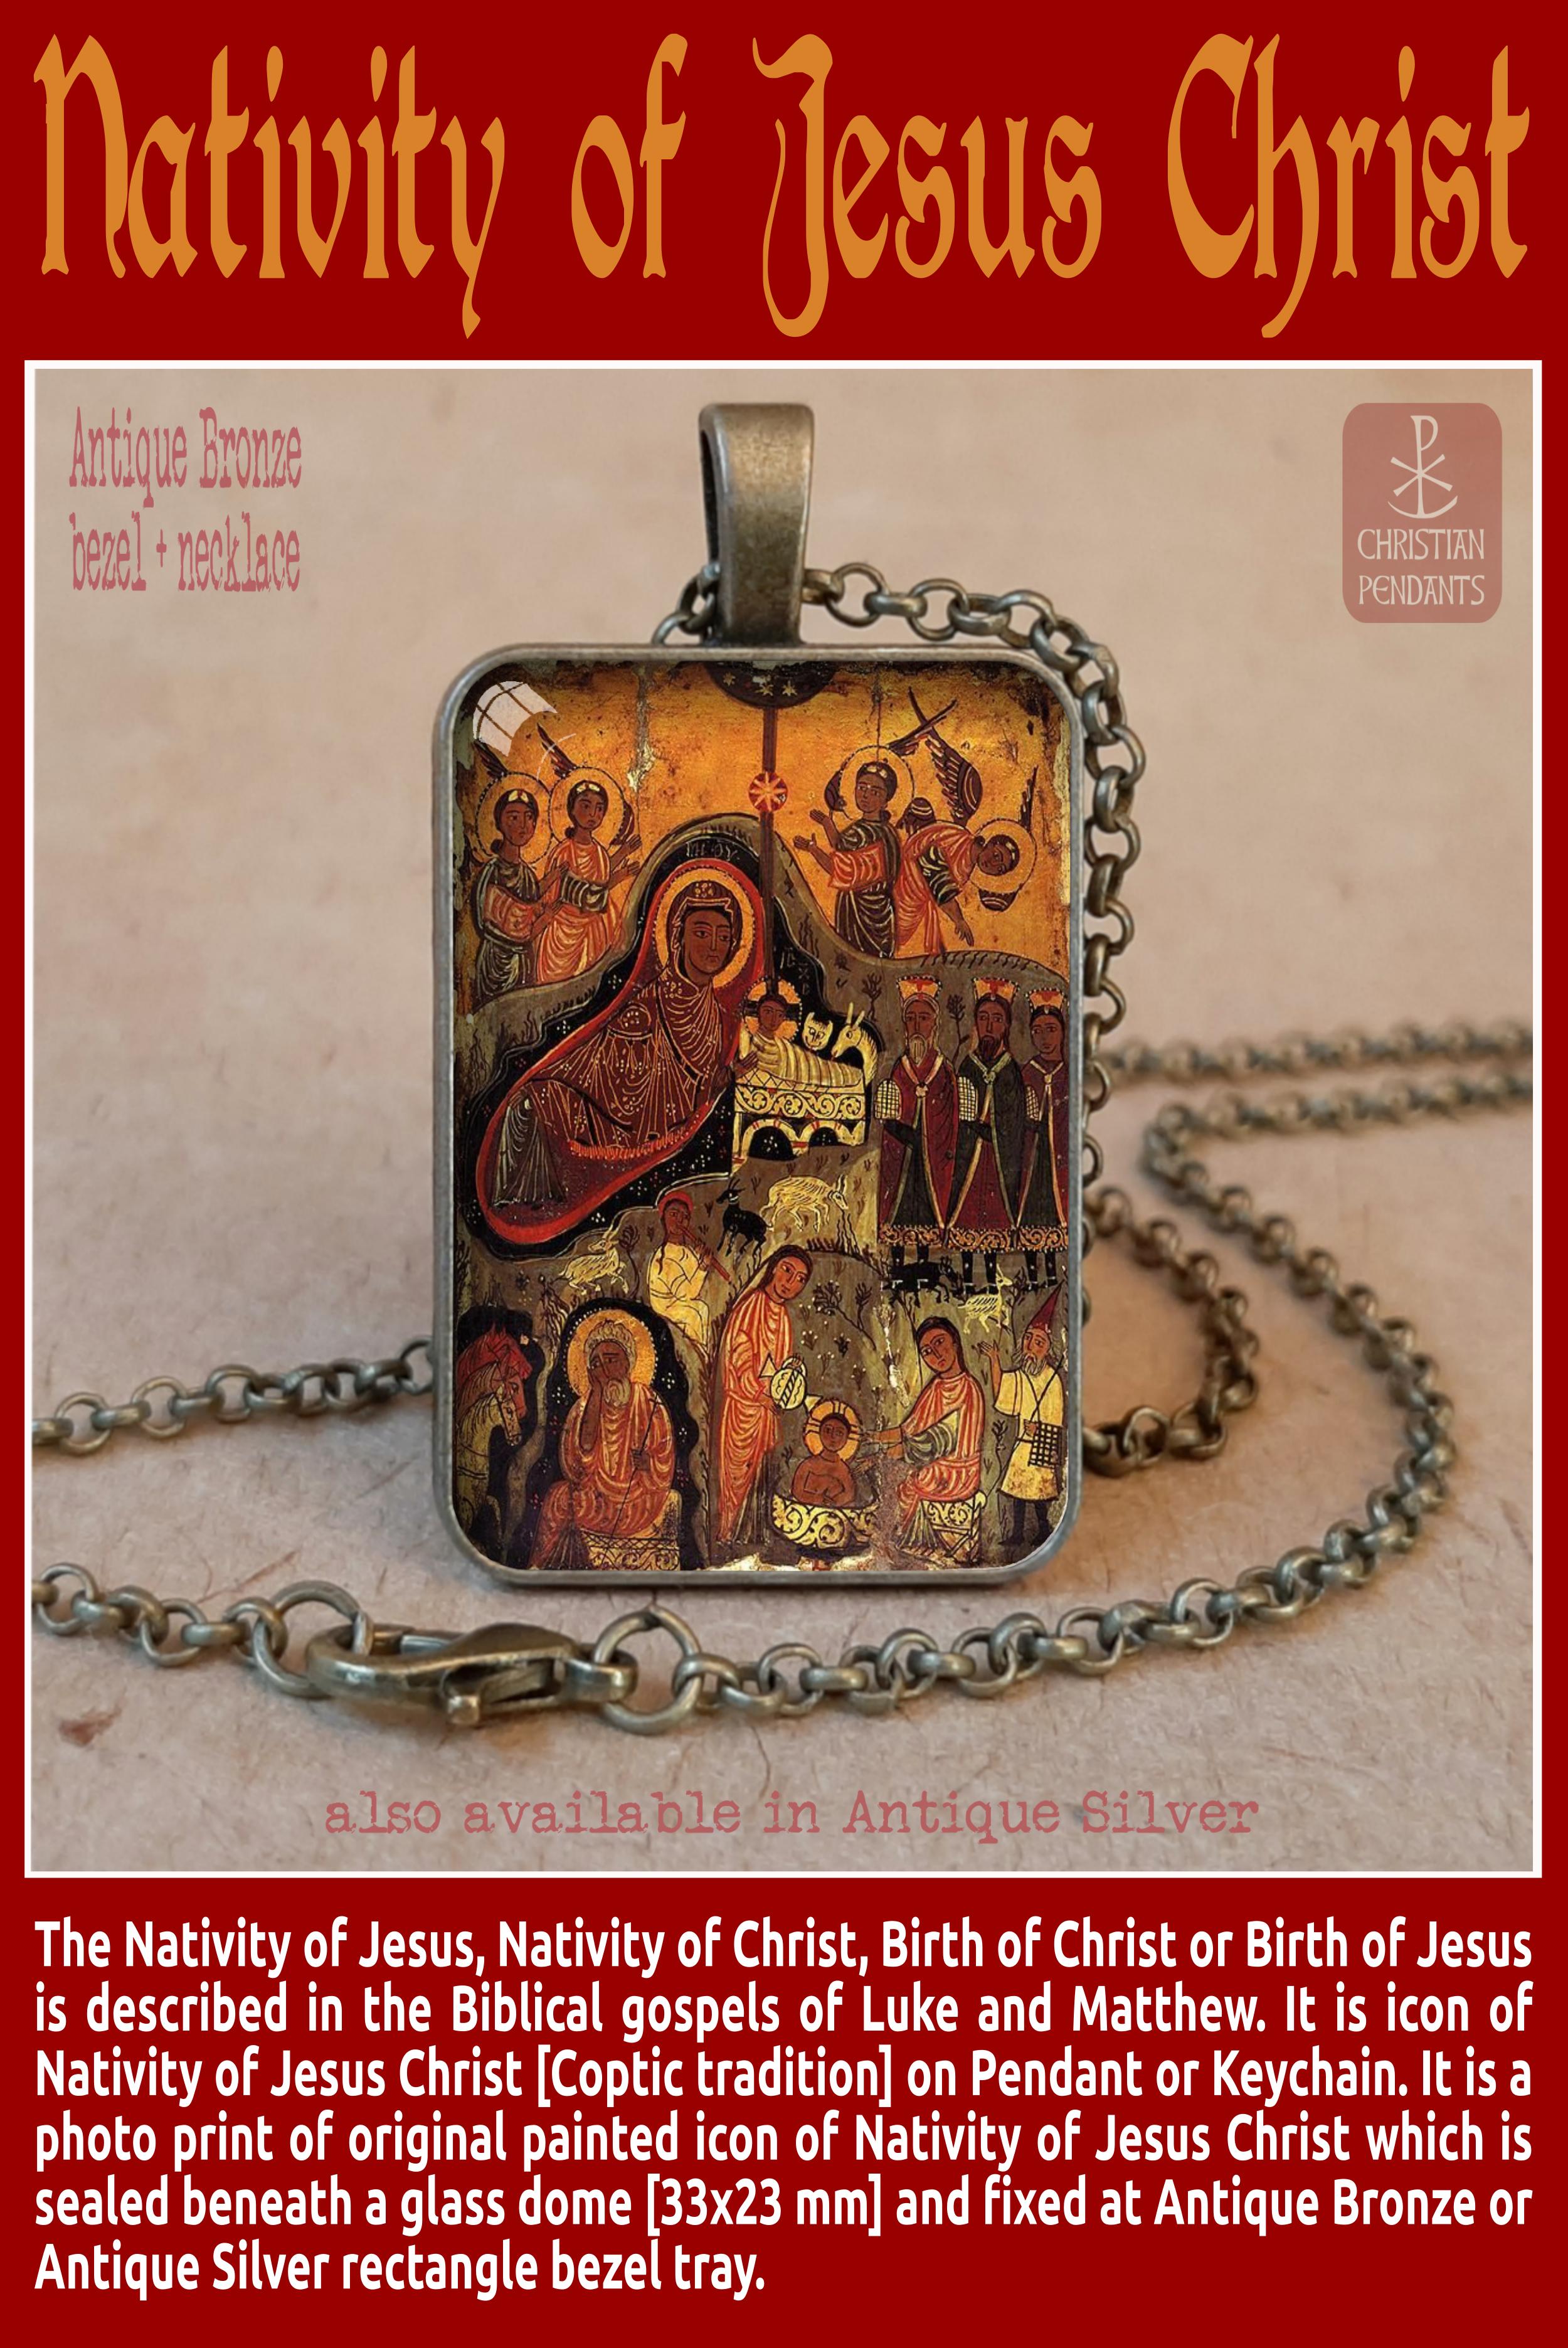 The Nativity of Jesus, Nativity of Christ, Birth of Christ